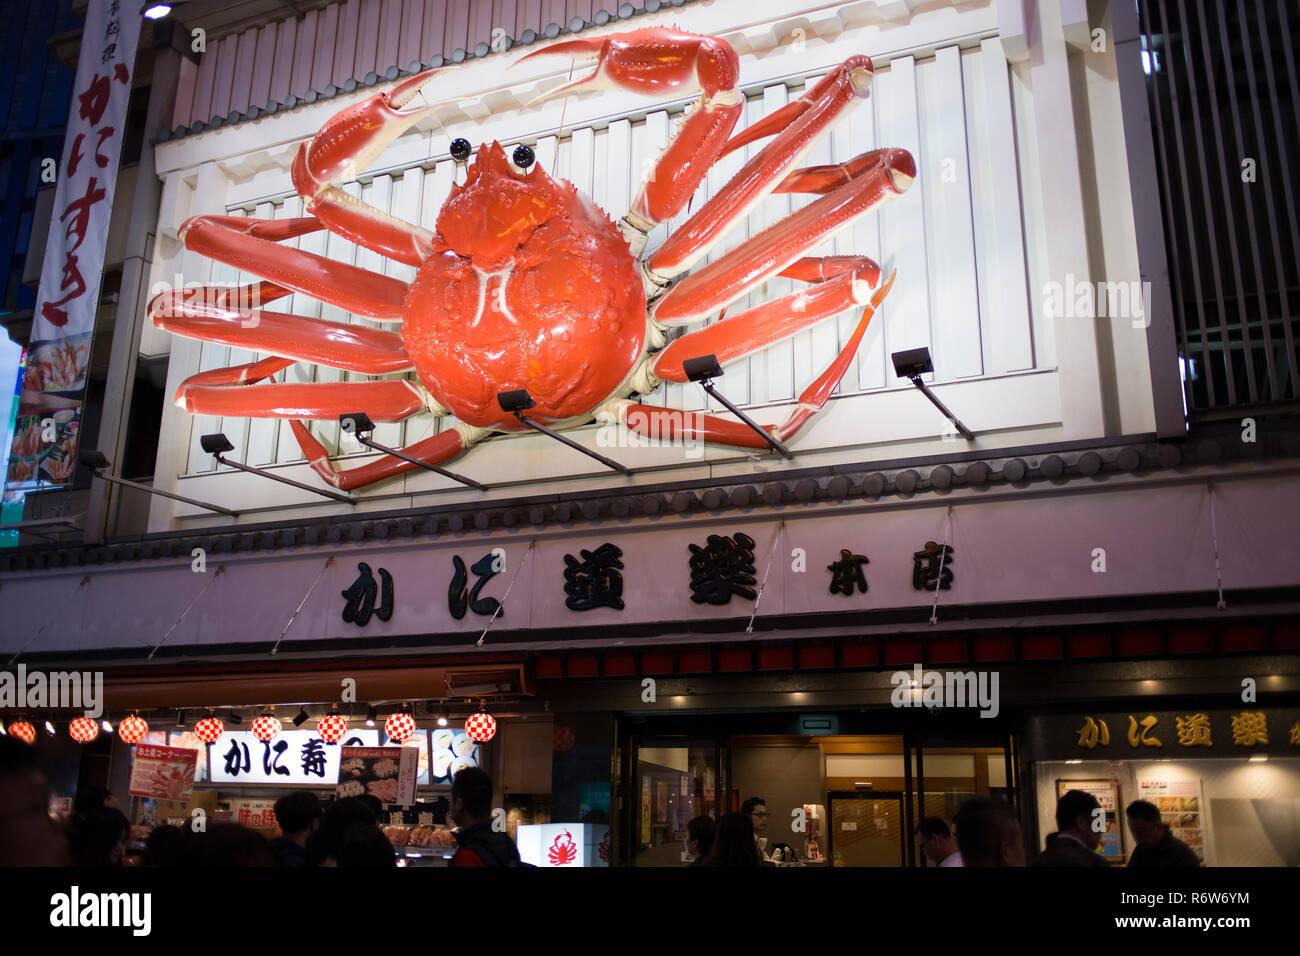 Minami (meaning South in English) in Osaka, Japan.  Photo by Akira Suemori - Stock Image